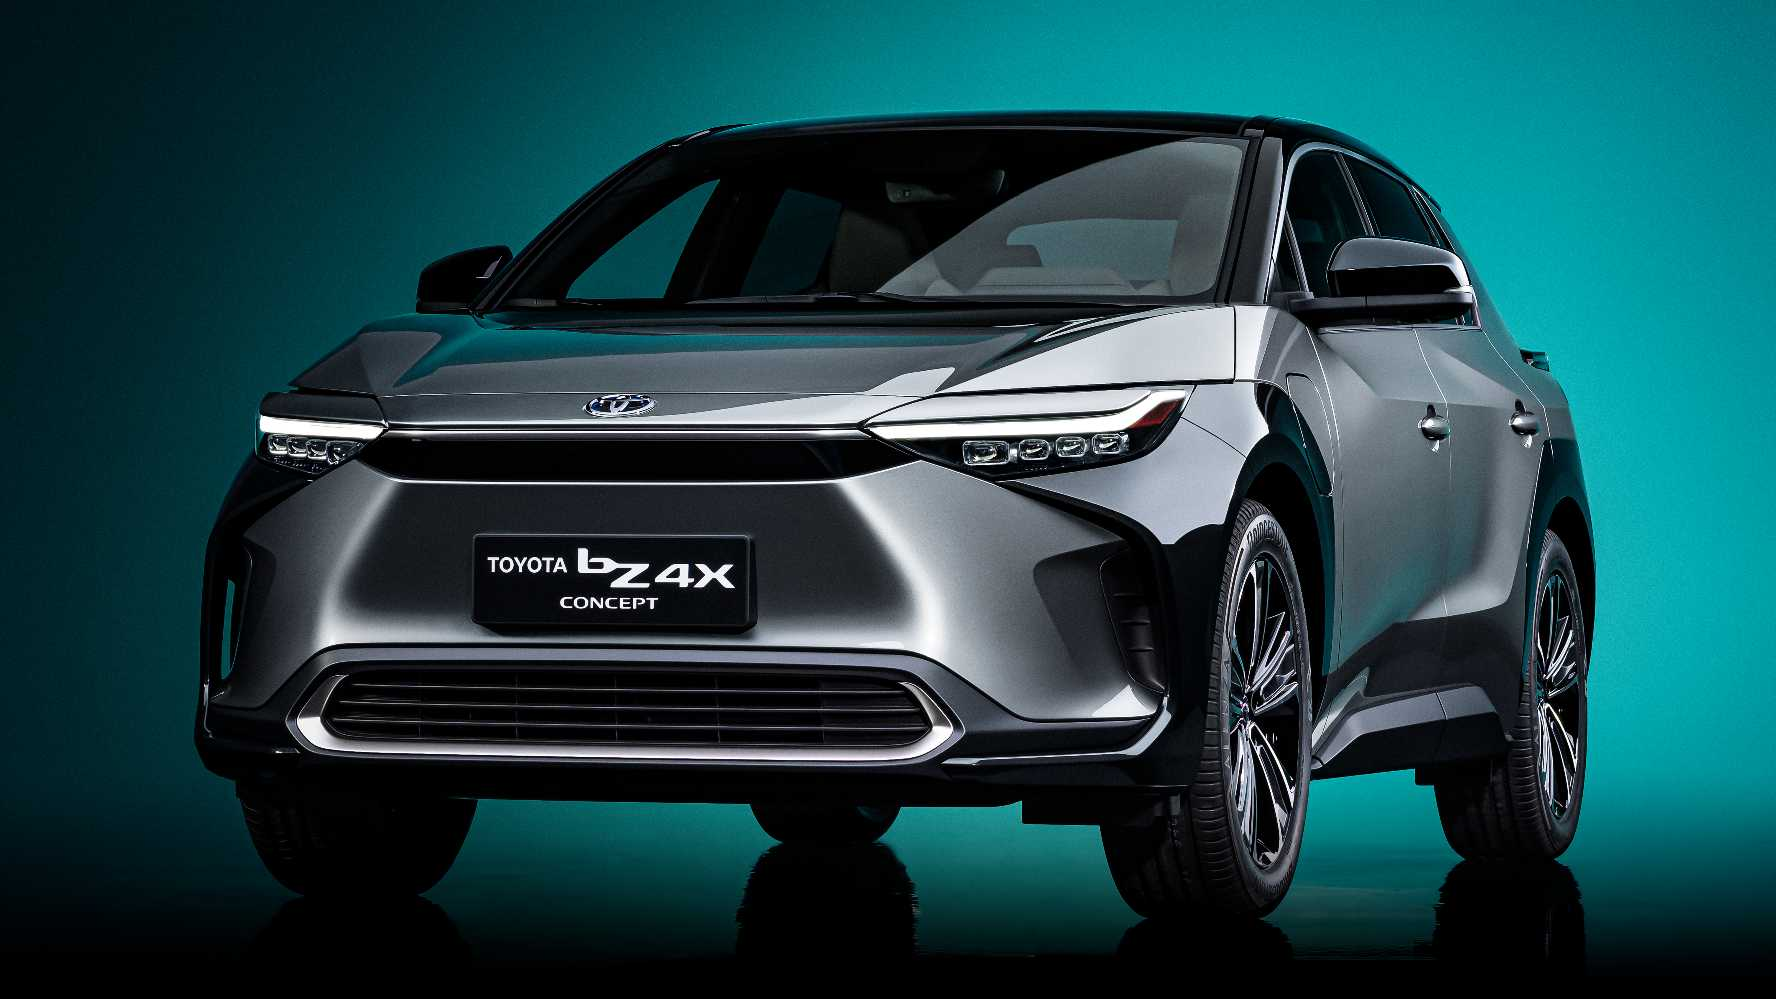 Toyota bZ4X e-SUV concept debuts at Auto Shanghai 2021, marks birth of new EV sub-brand- Technology News, FP